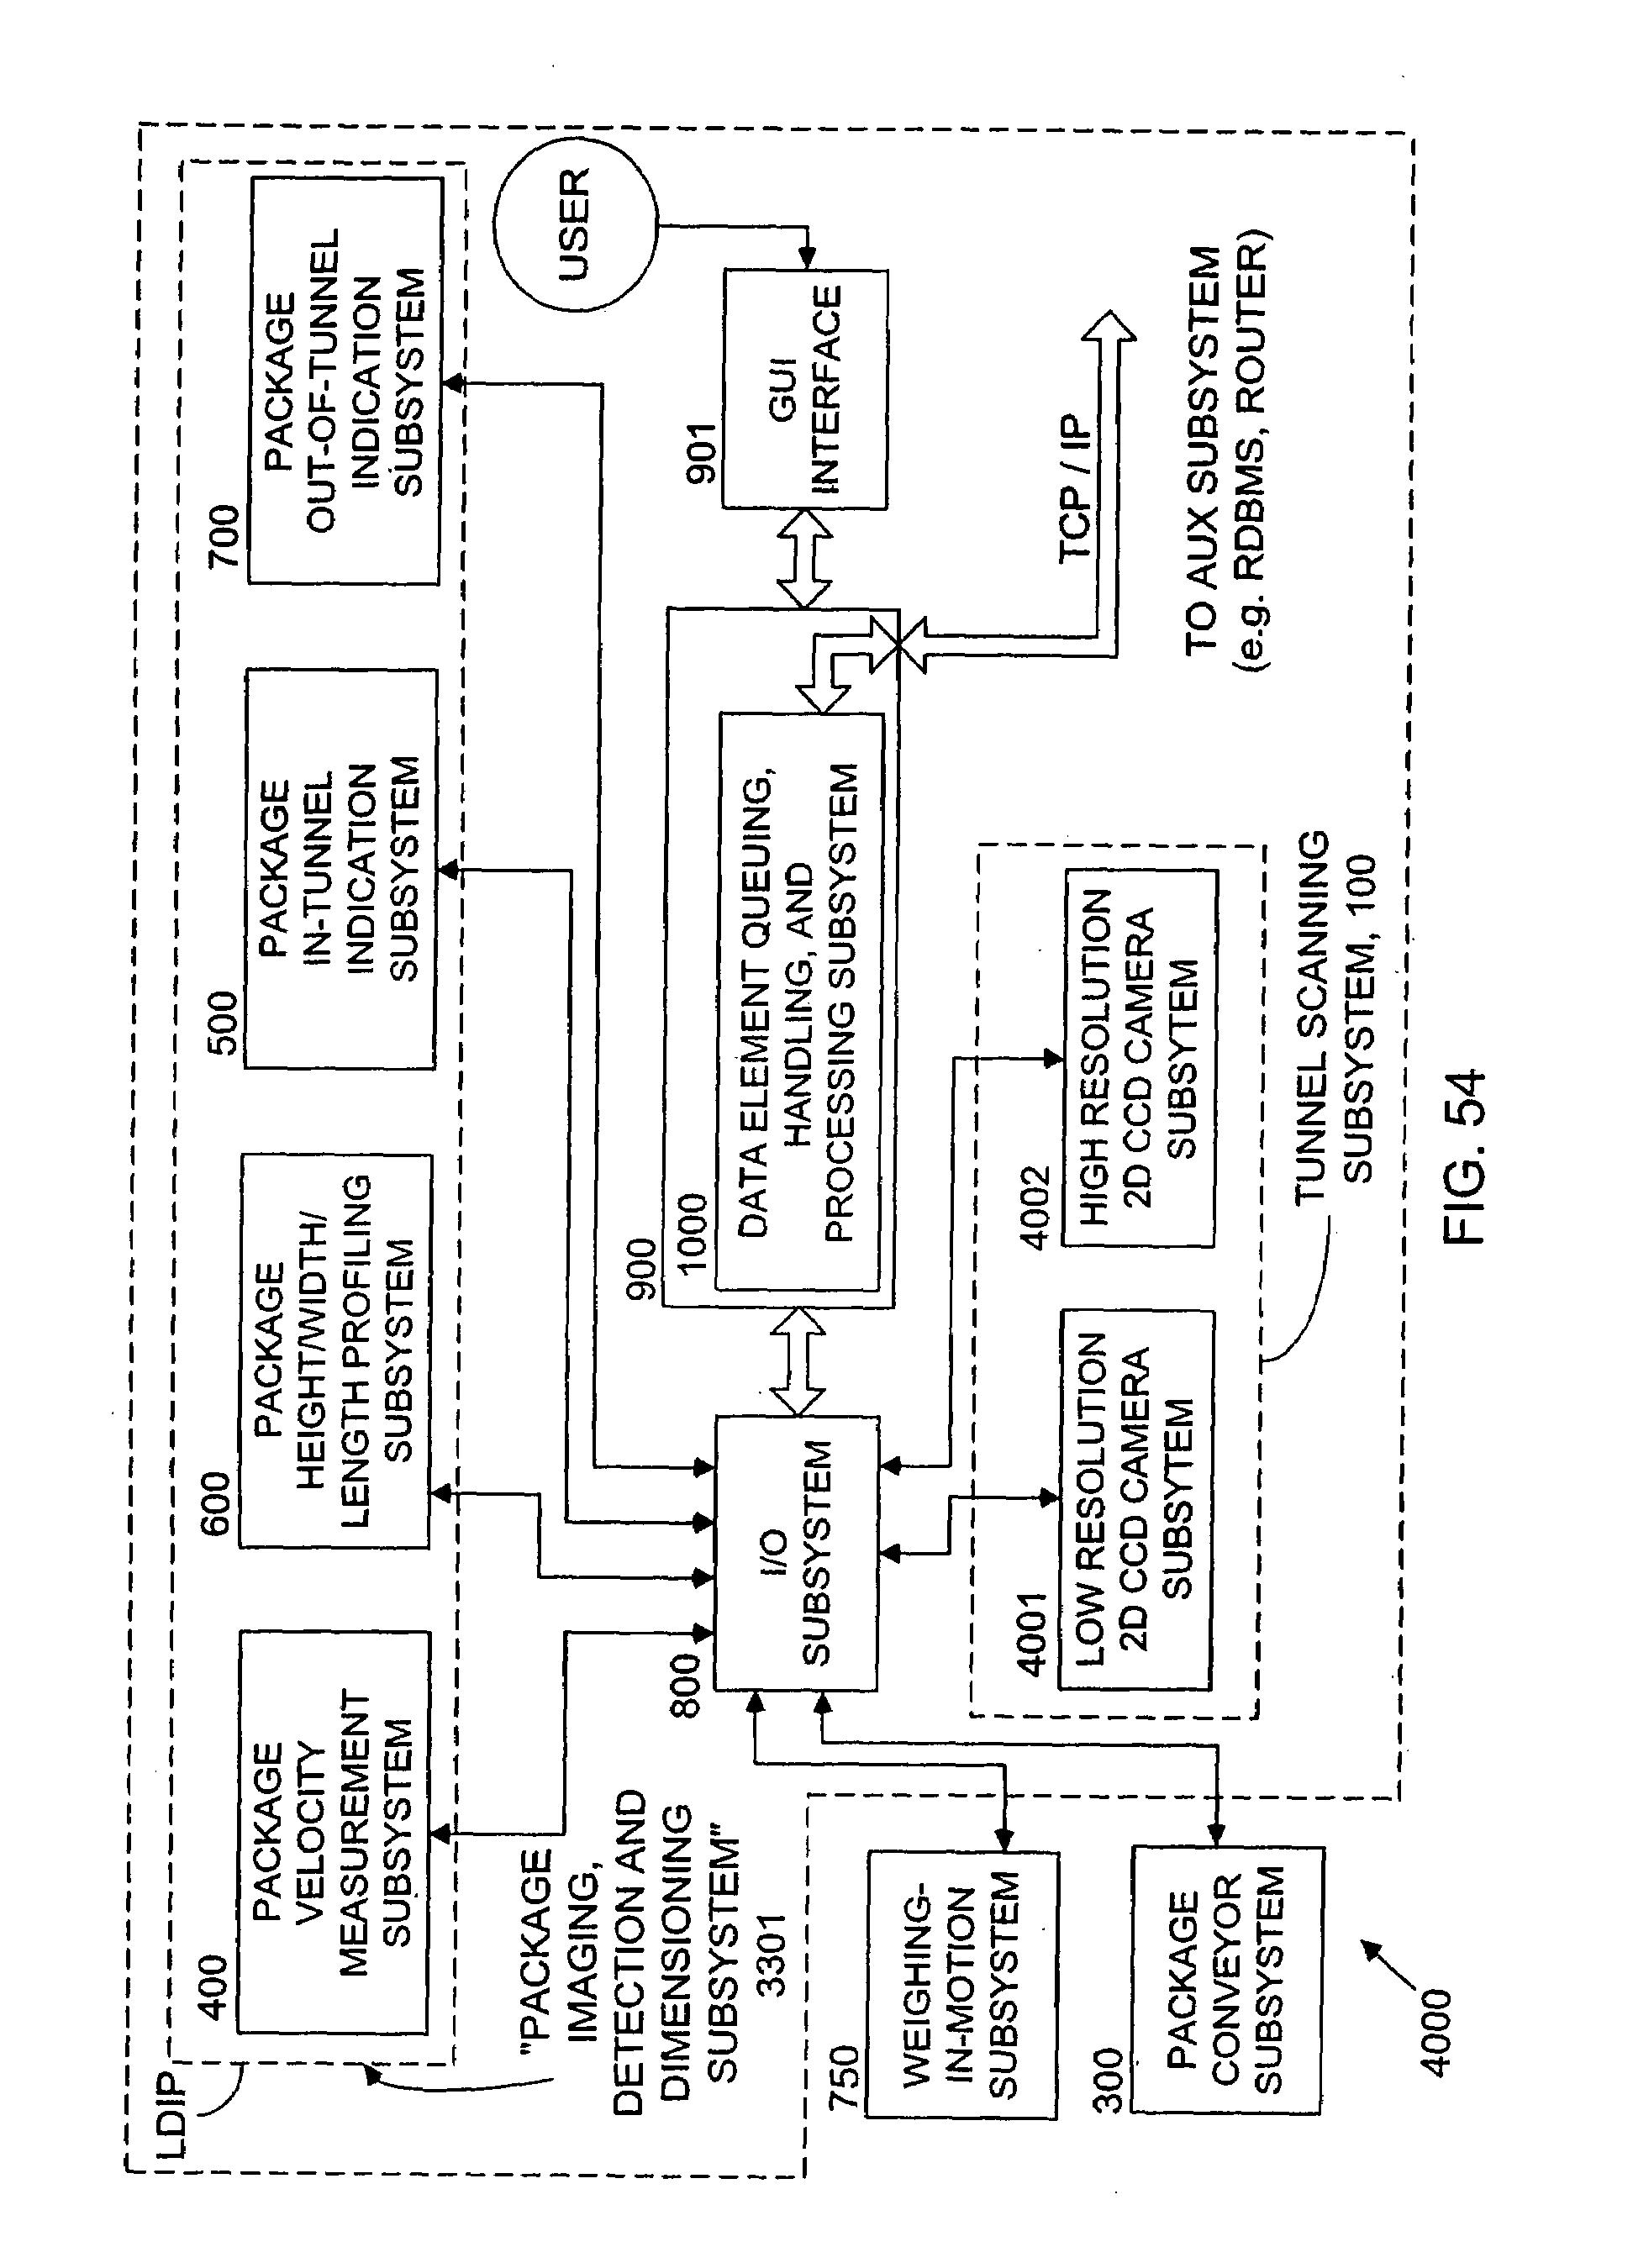 Patent Us 7527205 B2 Leddriven Led Display Circuit Design Powersupplycircuit Images